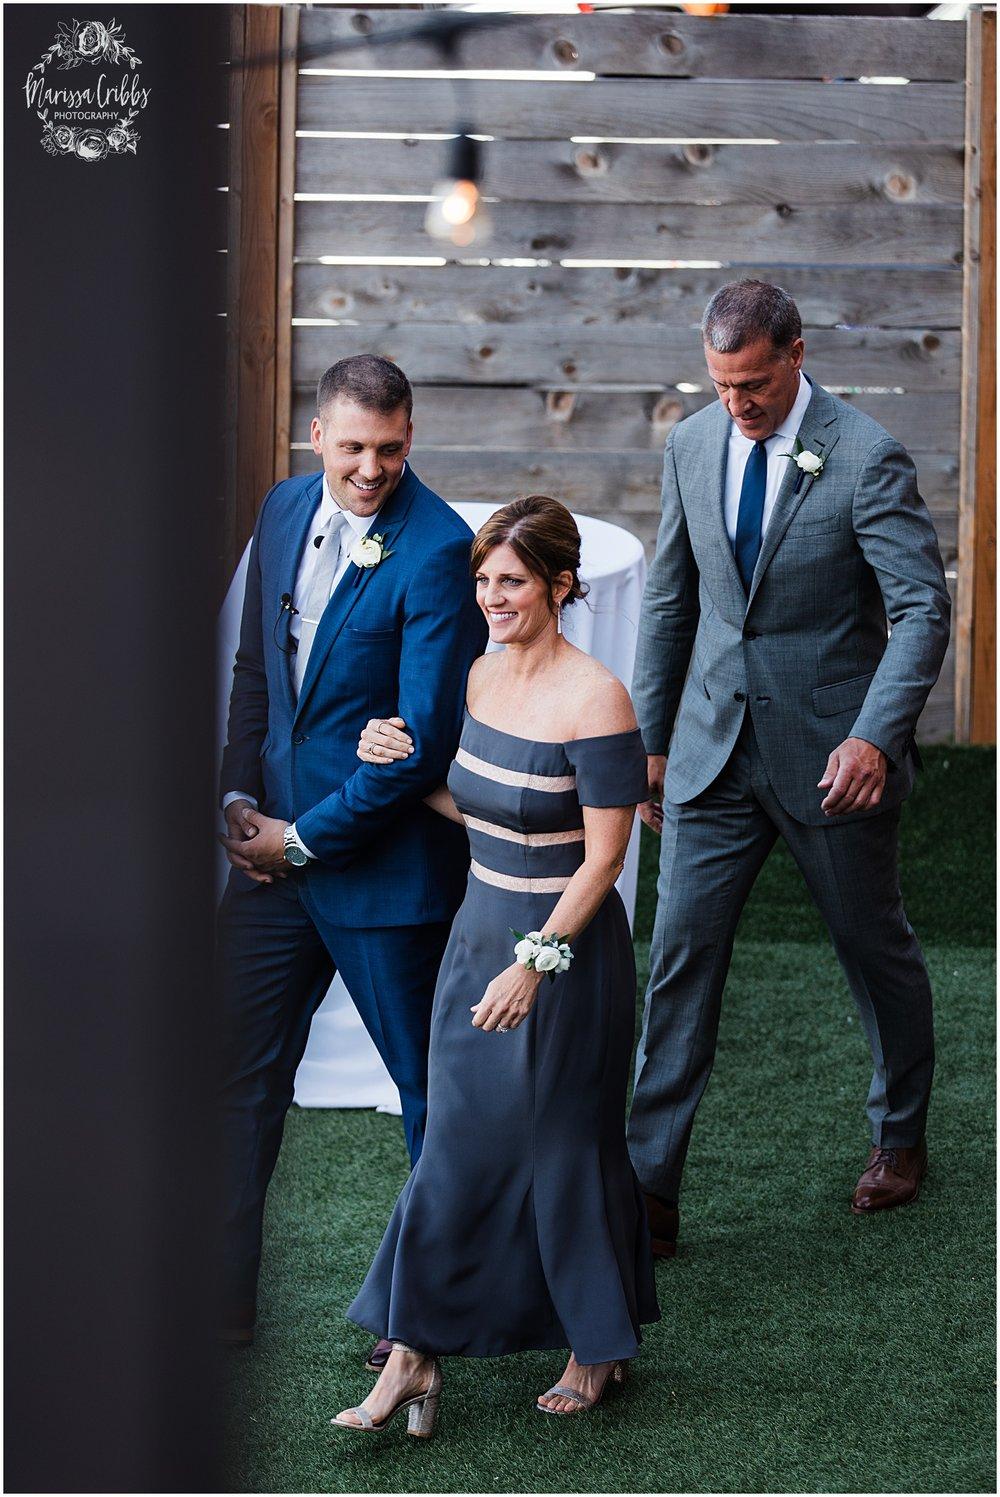 MAGNOLIA VENUE WEDDING | CHARLIE & NATALIE | MARISSA CRIBBS PHOTOGRAPHY_5746.jpg